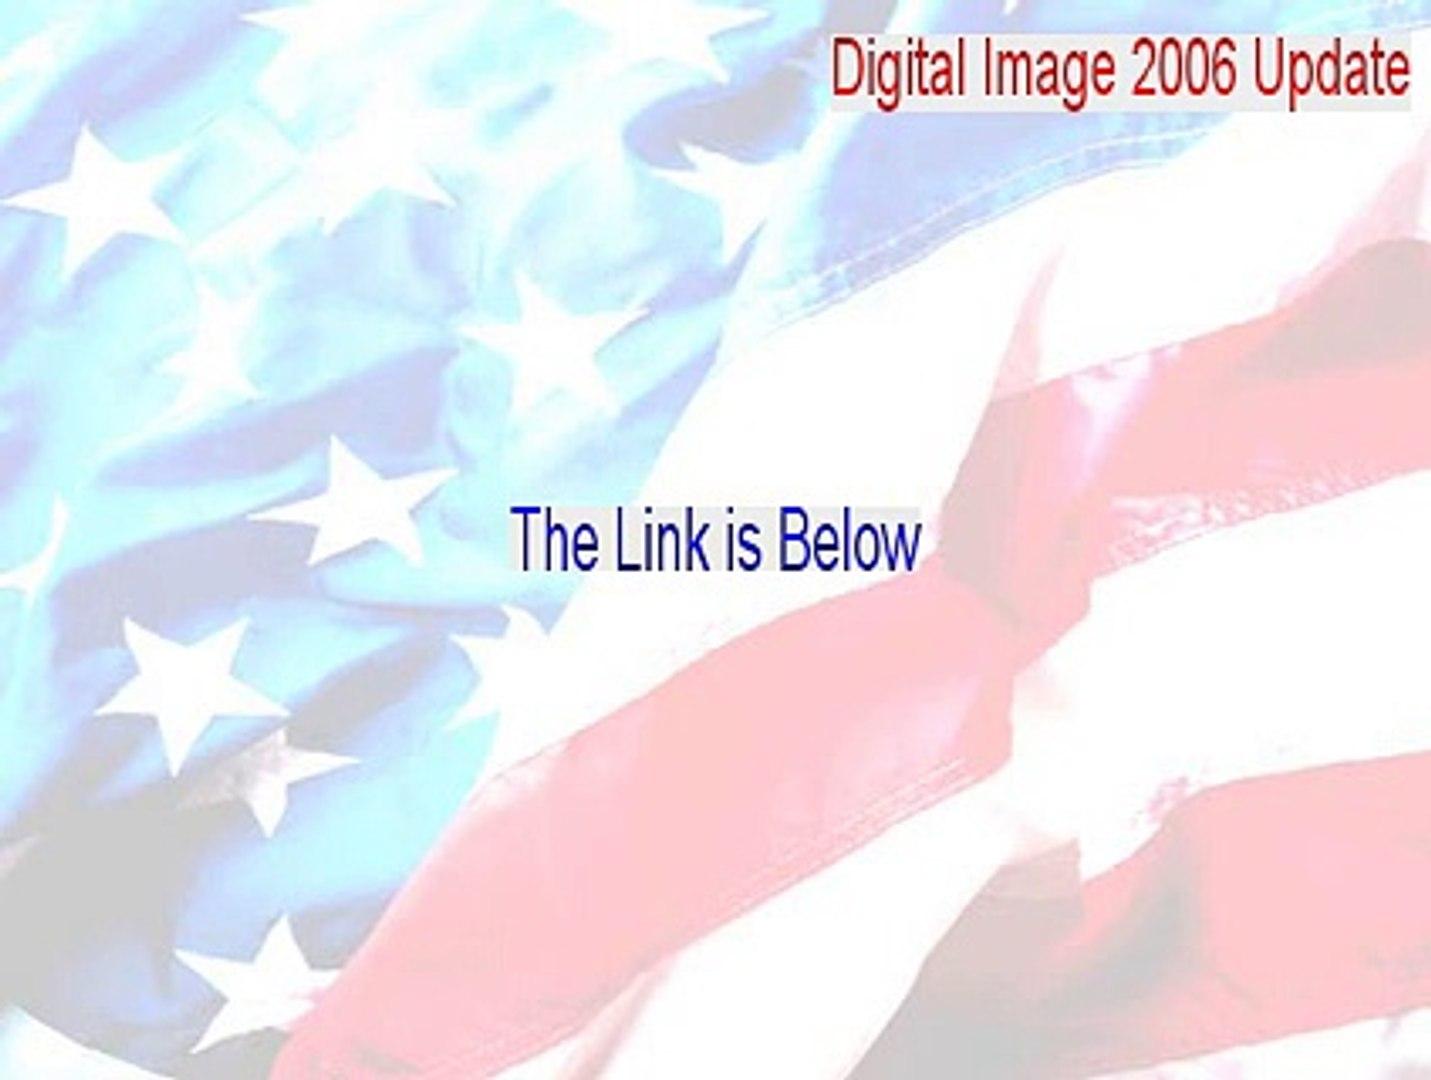 Digital Image 2006 Update Key Gen [Digital Image 2006 Updatemicrosoft digital image 2006 update]